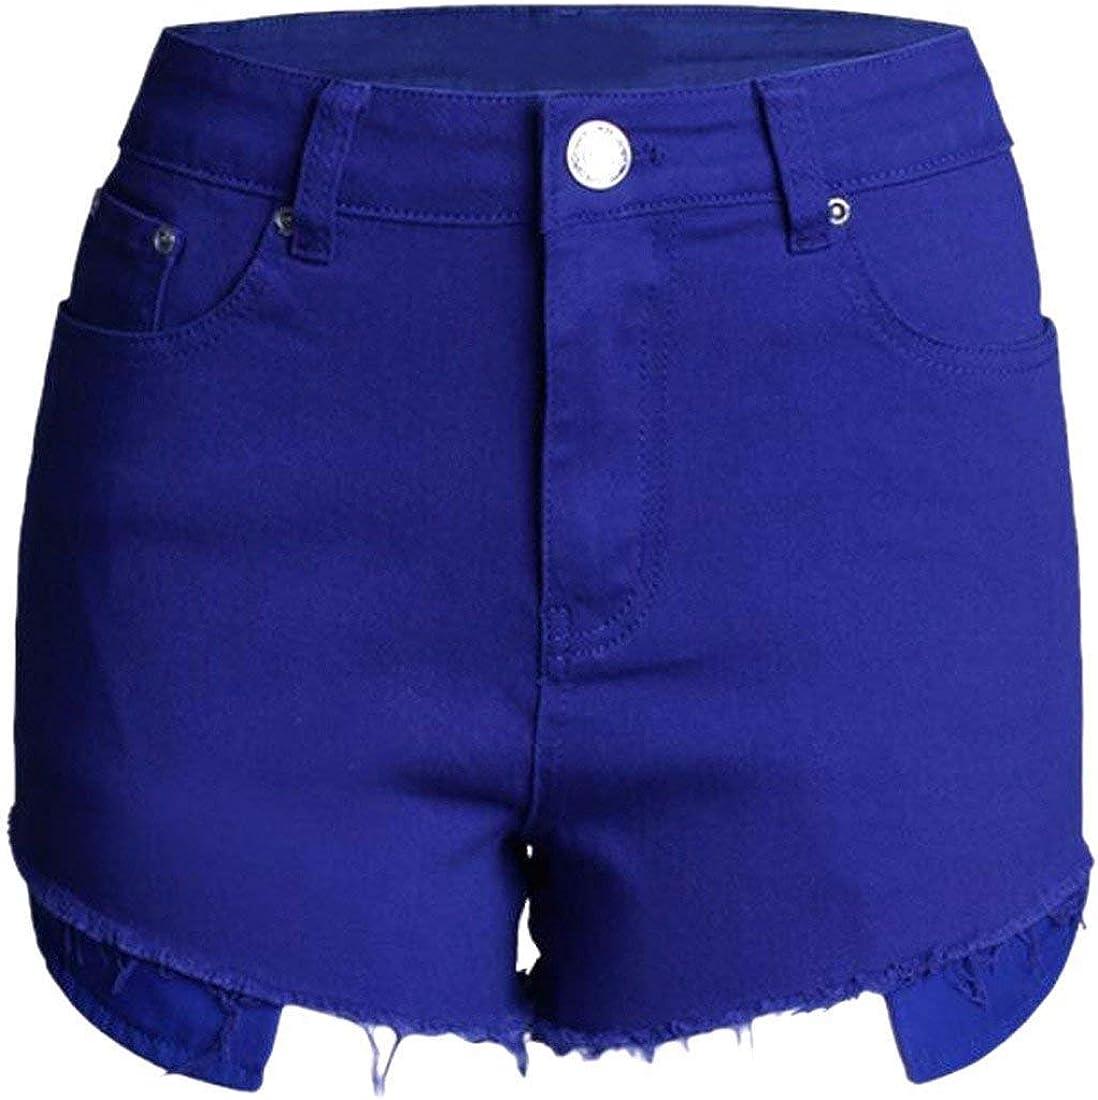 Algodón Imperio Cintura Alta Ebene Jeans Vintage Moda Pantalones ...